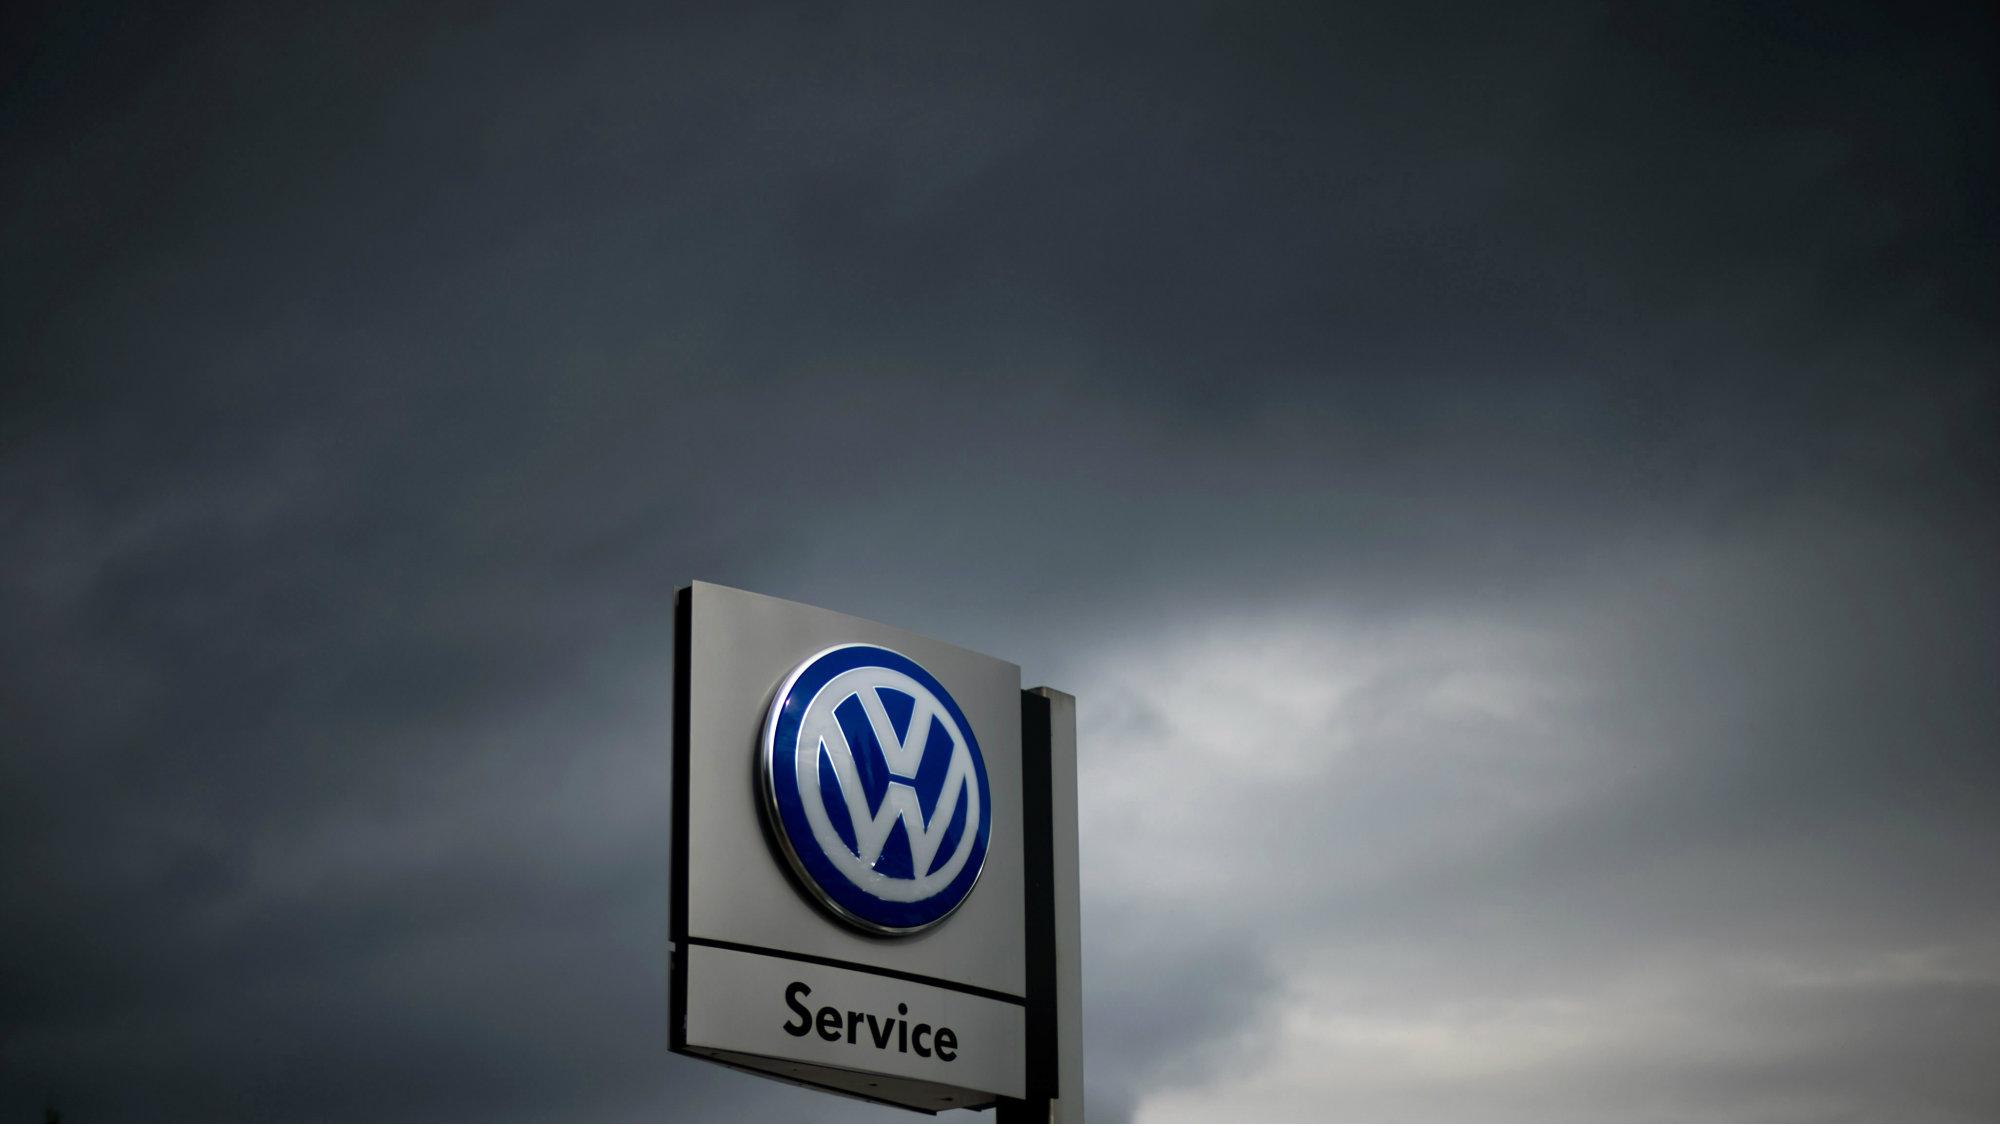 over photo diesels diesel gallery carscoops the touareg world vw recall around volkswagen from recalls